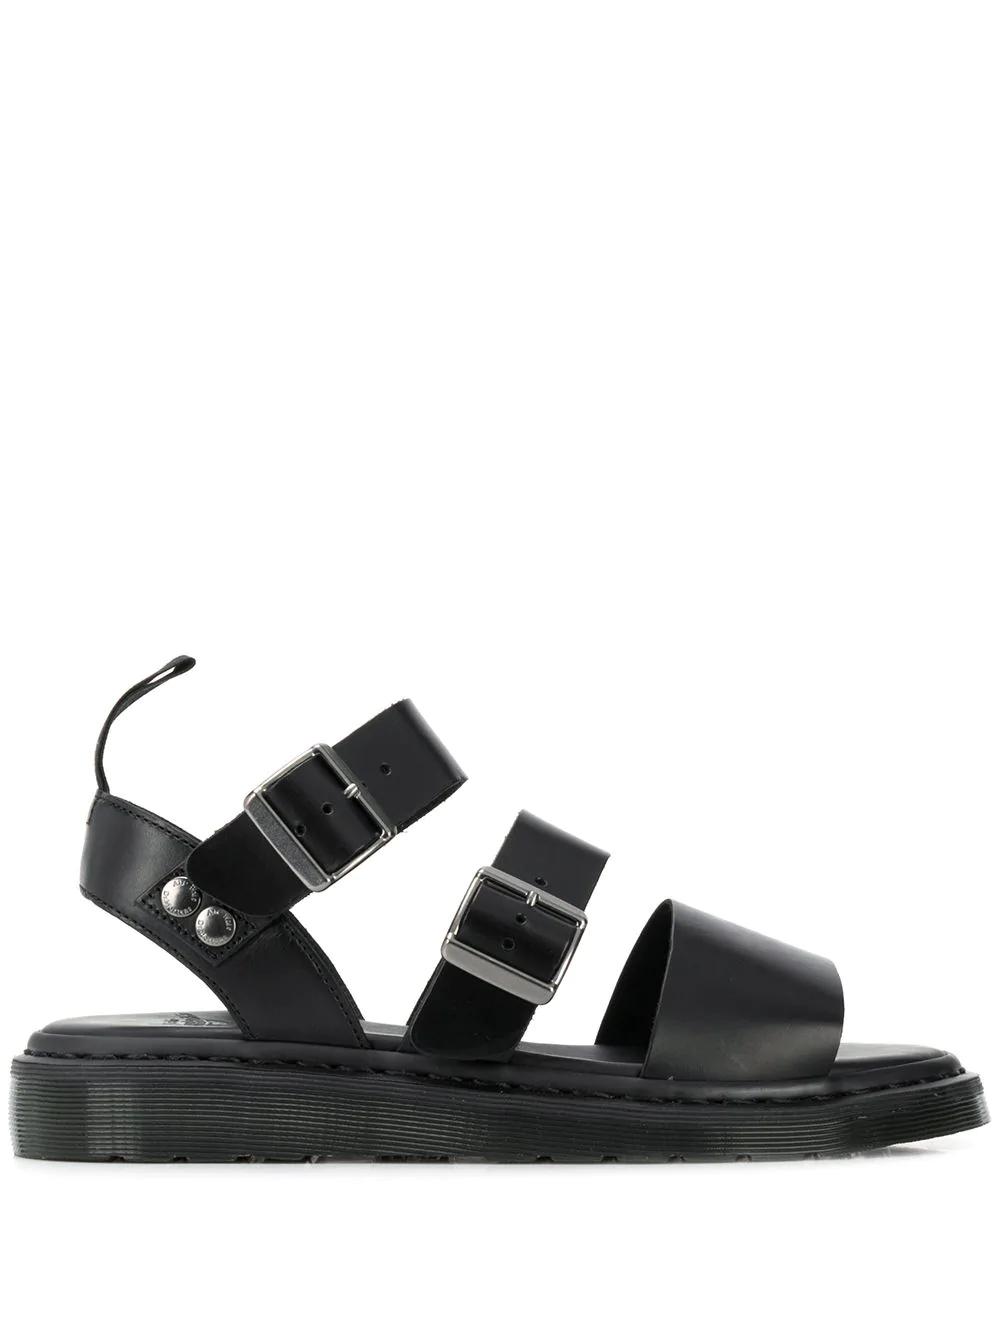 a00330e4 Dr. Martens Gryphon Sandal - Black | ModeSens